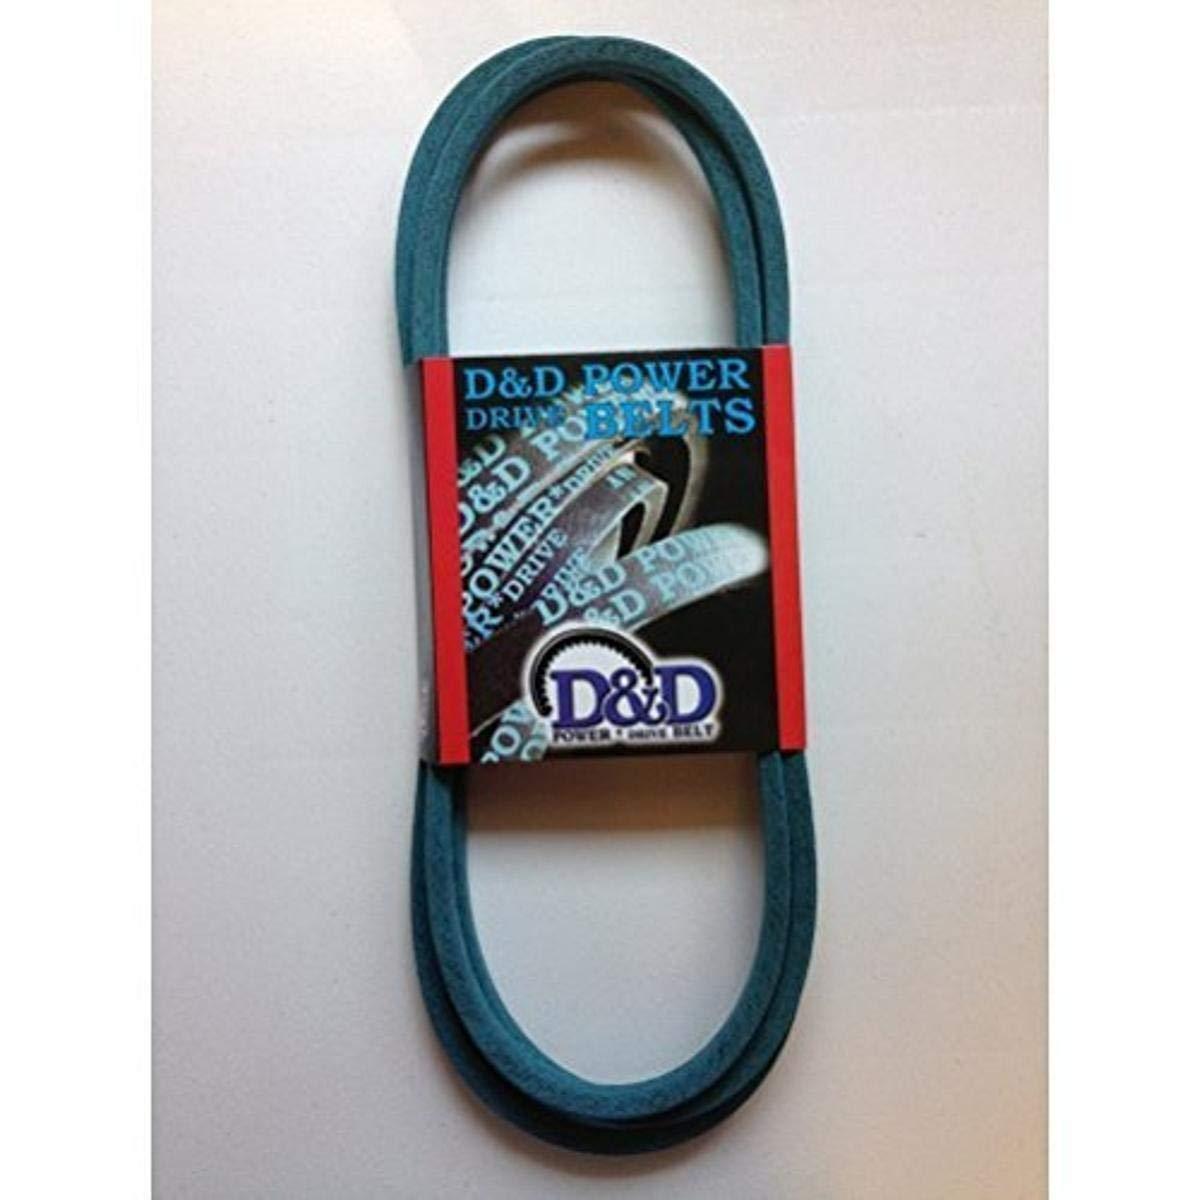 D&D PowerDrive 4461779 Tractor Supply Kevlar Replacement Belt, 5LK, 1 -Band, 77